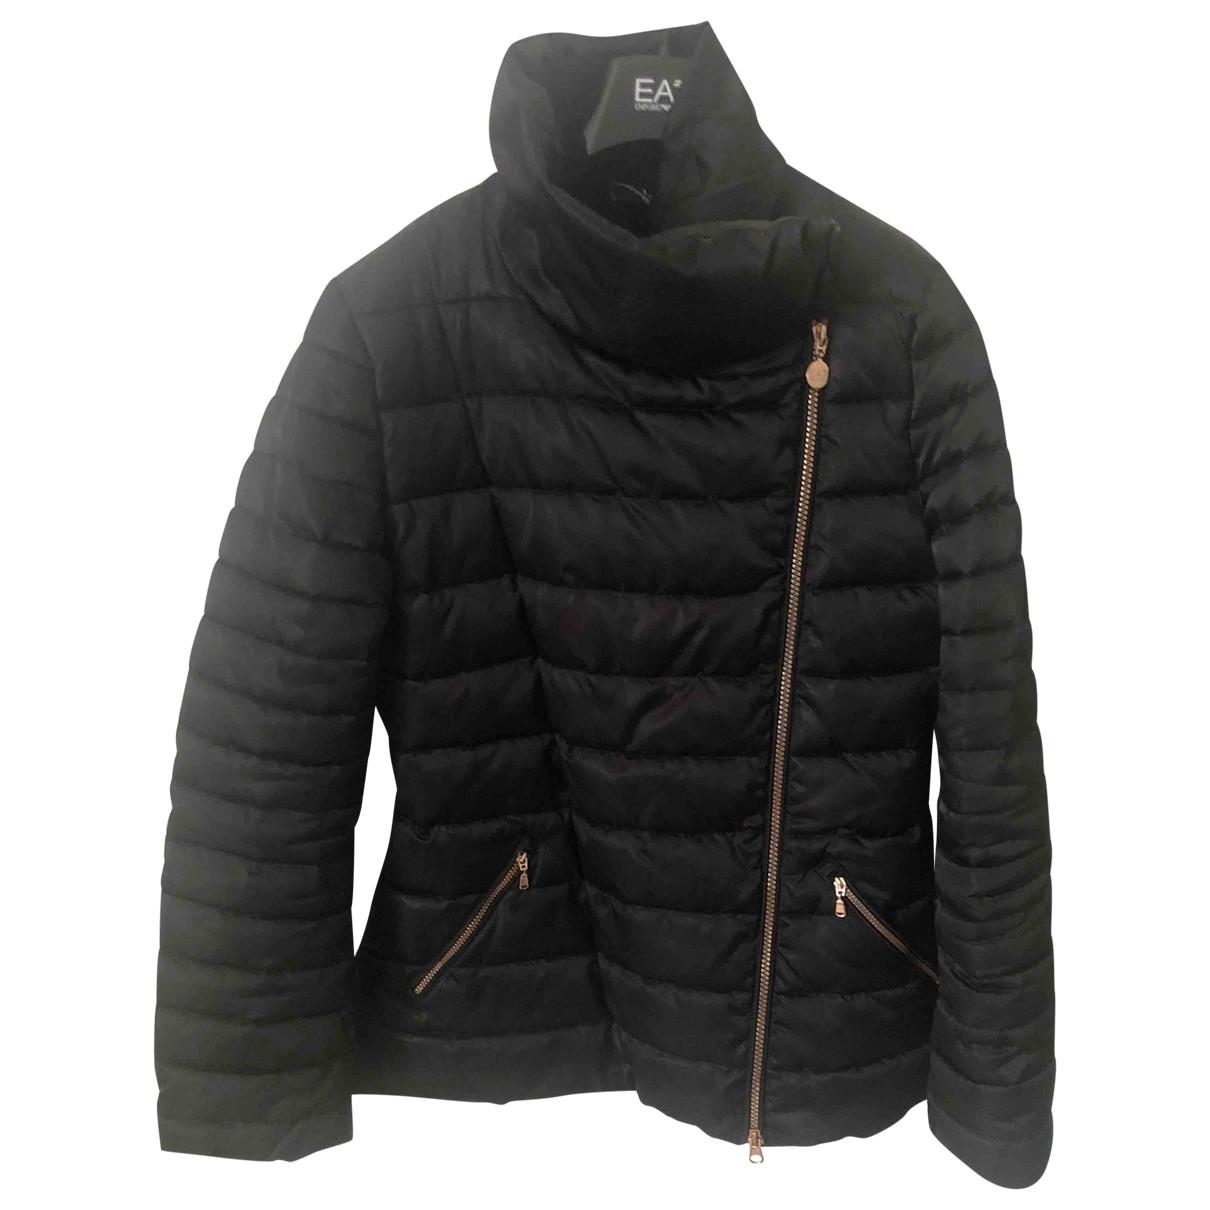 Emporio Armani \N Black coat for Women 42 IT